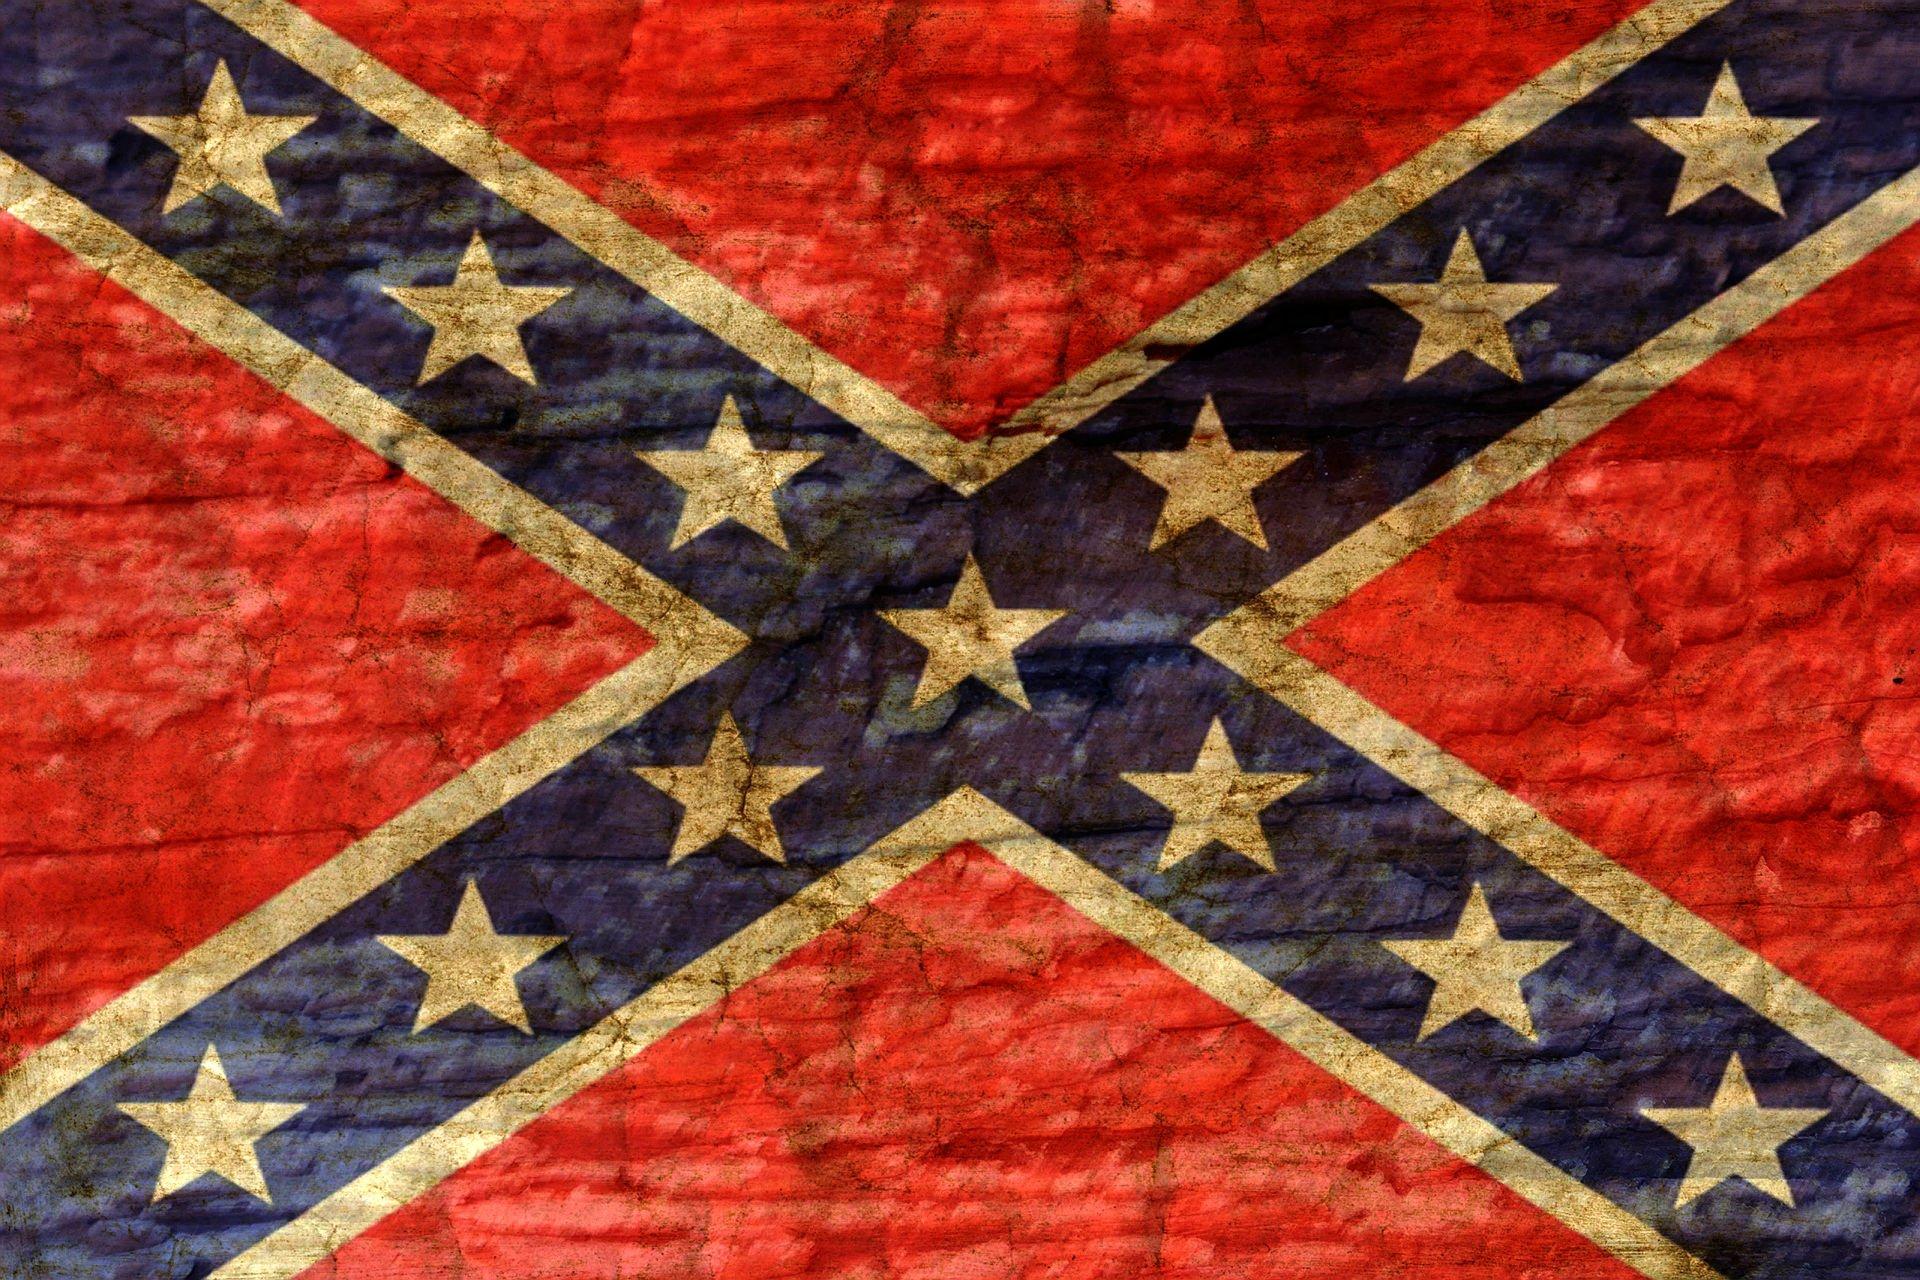 CONFEDERATE flag usa america united states csa civil war rebel dixie 1920x1280